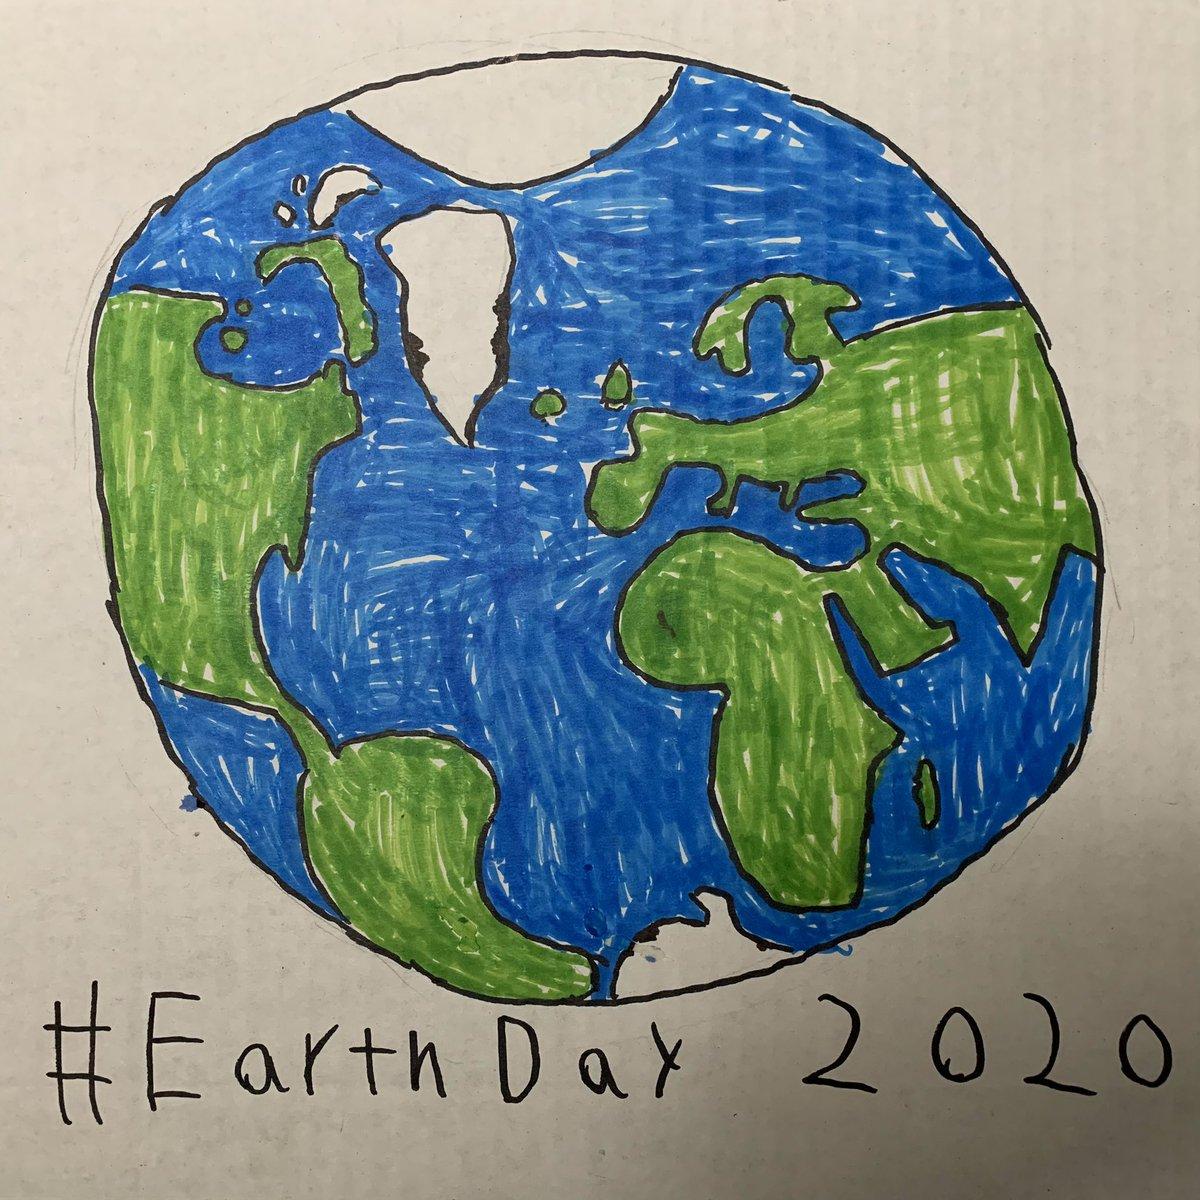 Happy #EarthDay2020! @tedwheeler @PortlandBPS @CityofBeaverton